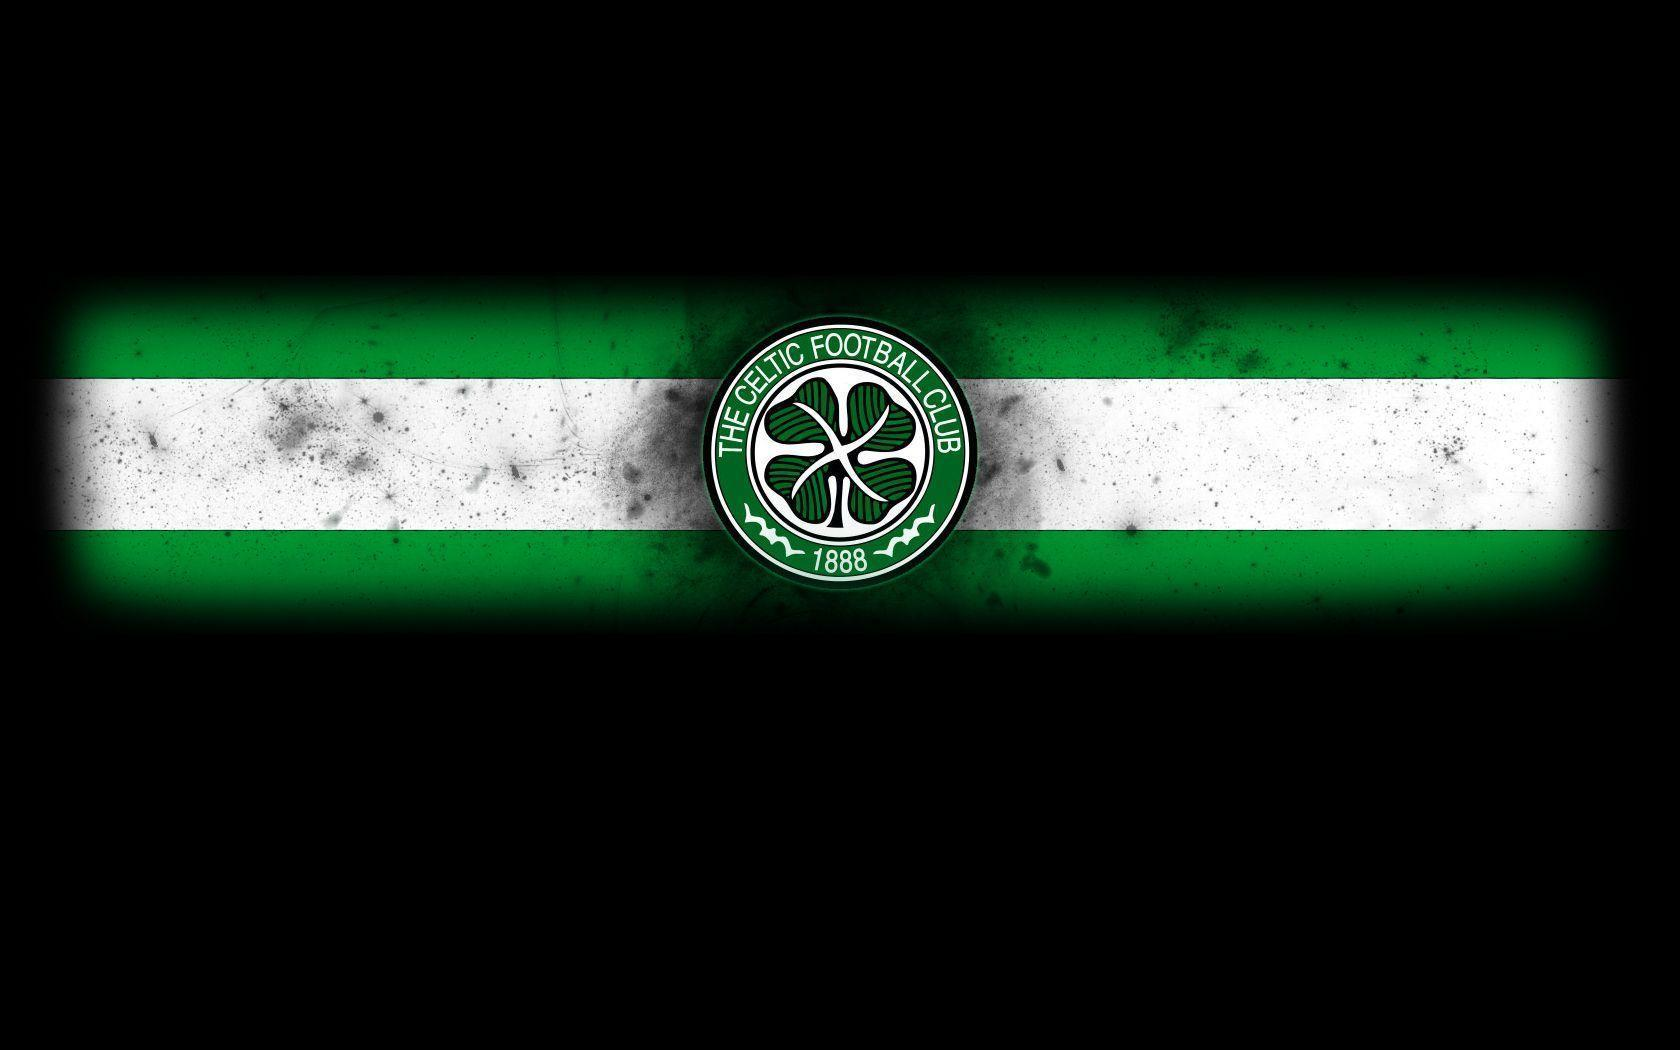 Celtic Fc 2016 Backgrounds  Wallpaper Cave